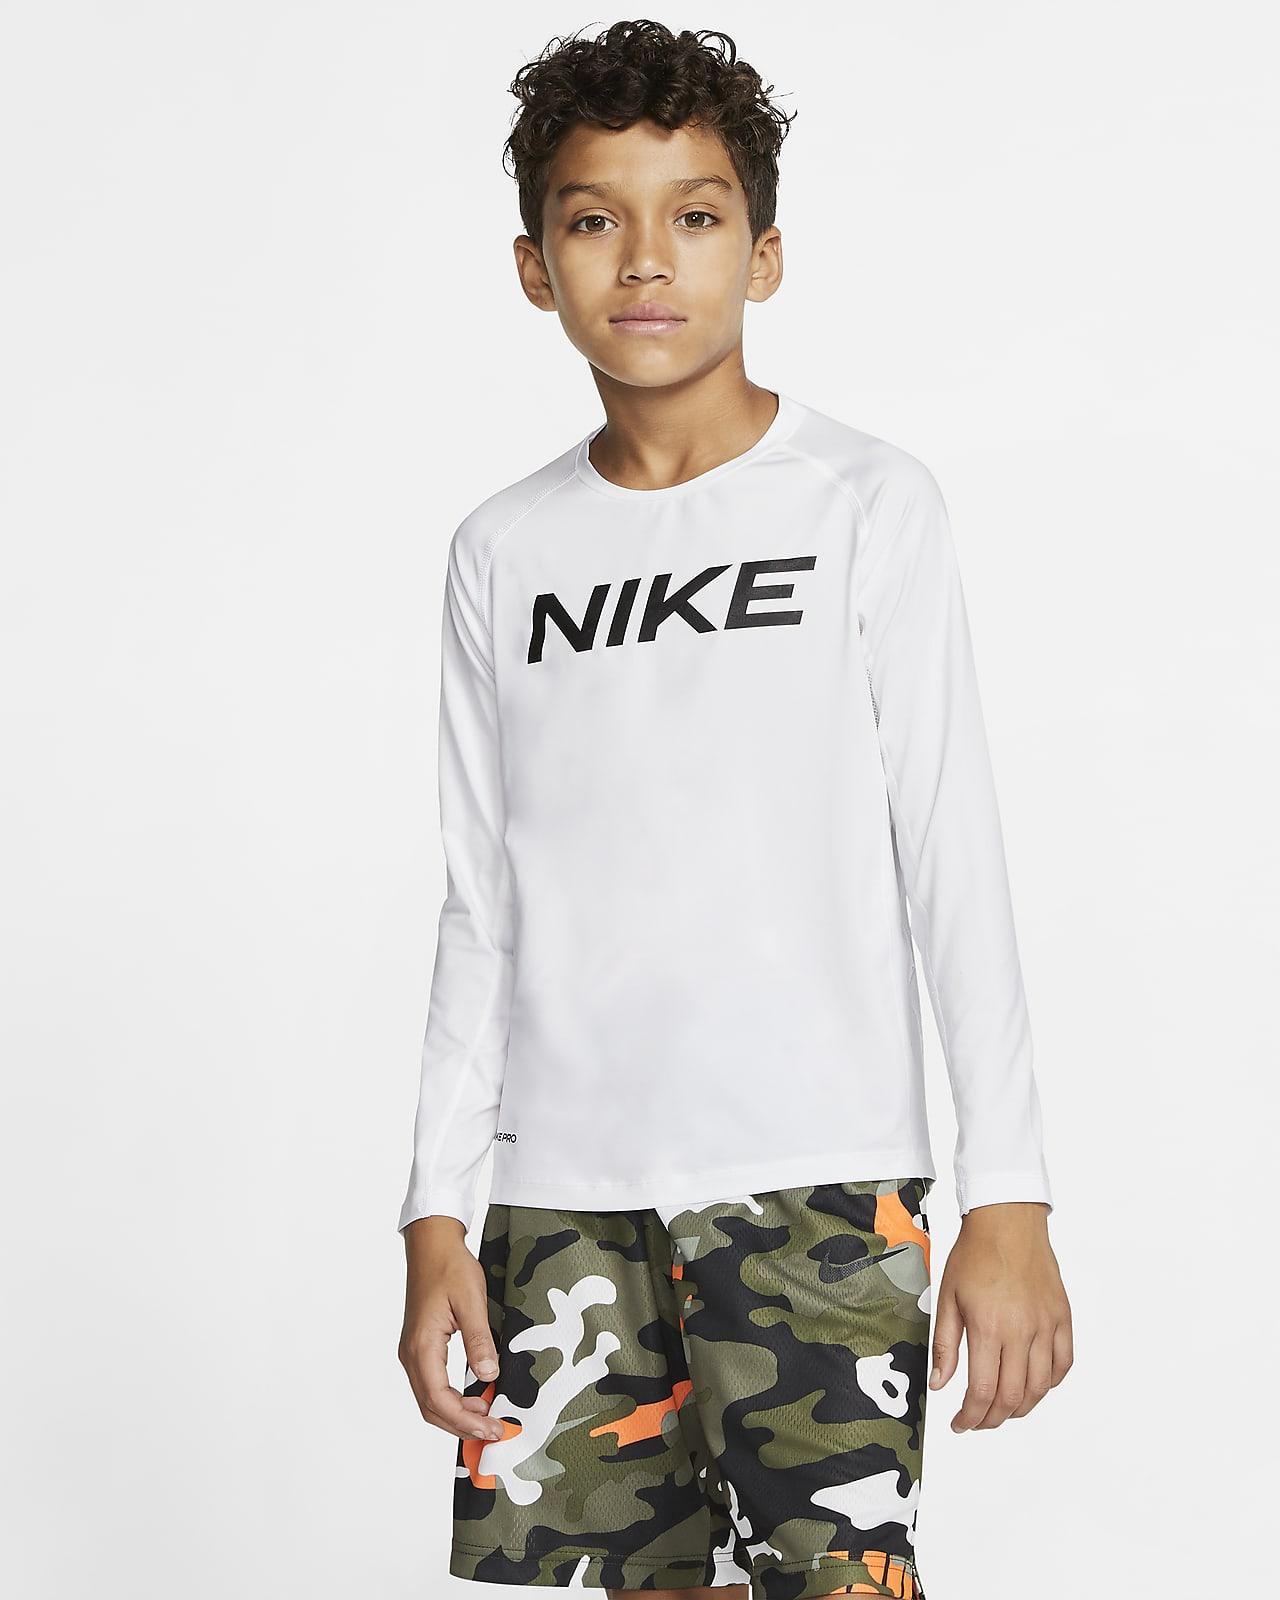 Prenda para la parte superior de entrenamiento de manga larga para niño talla grande Nike Pro